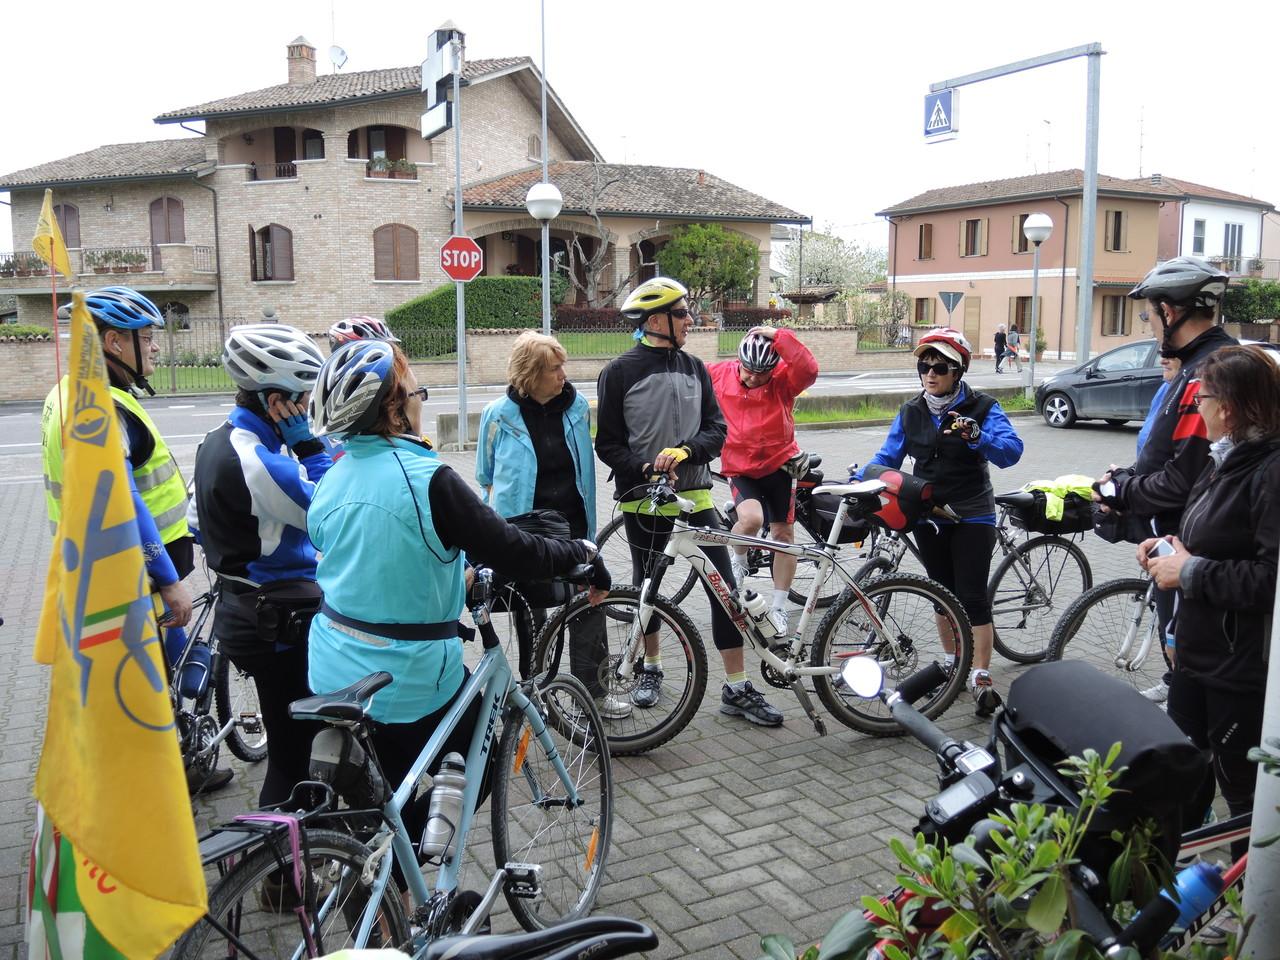 arrivo amici di Forlì